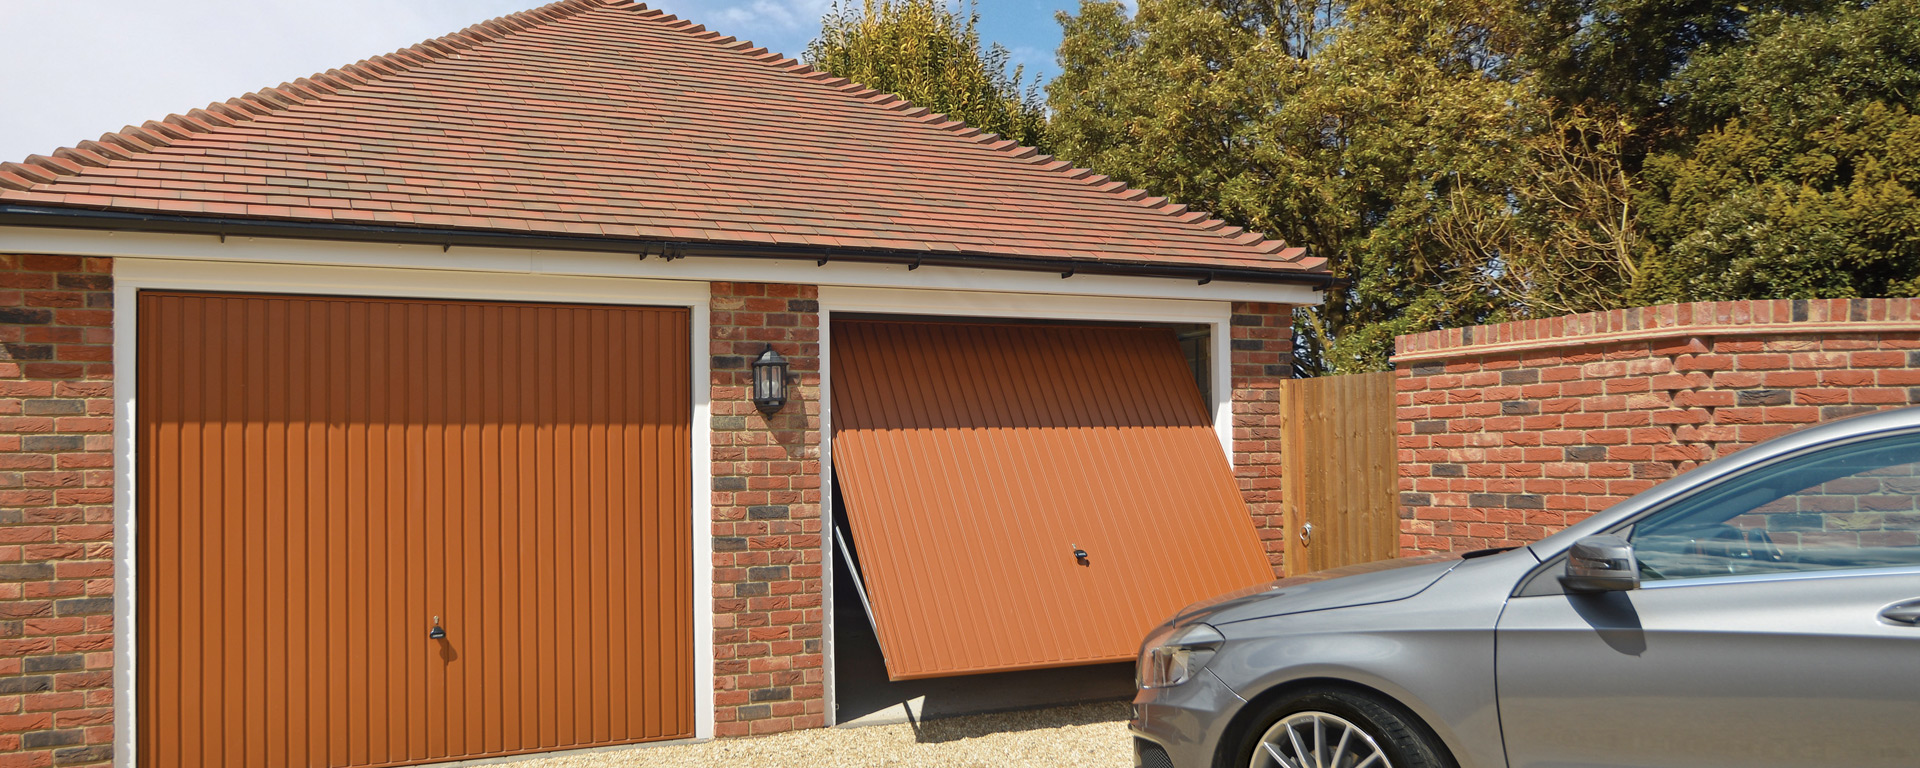 Digby Services Garage Doors